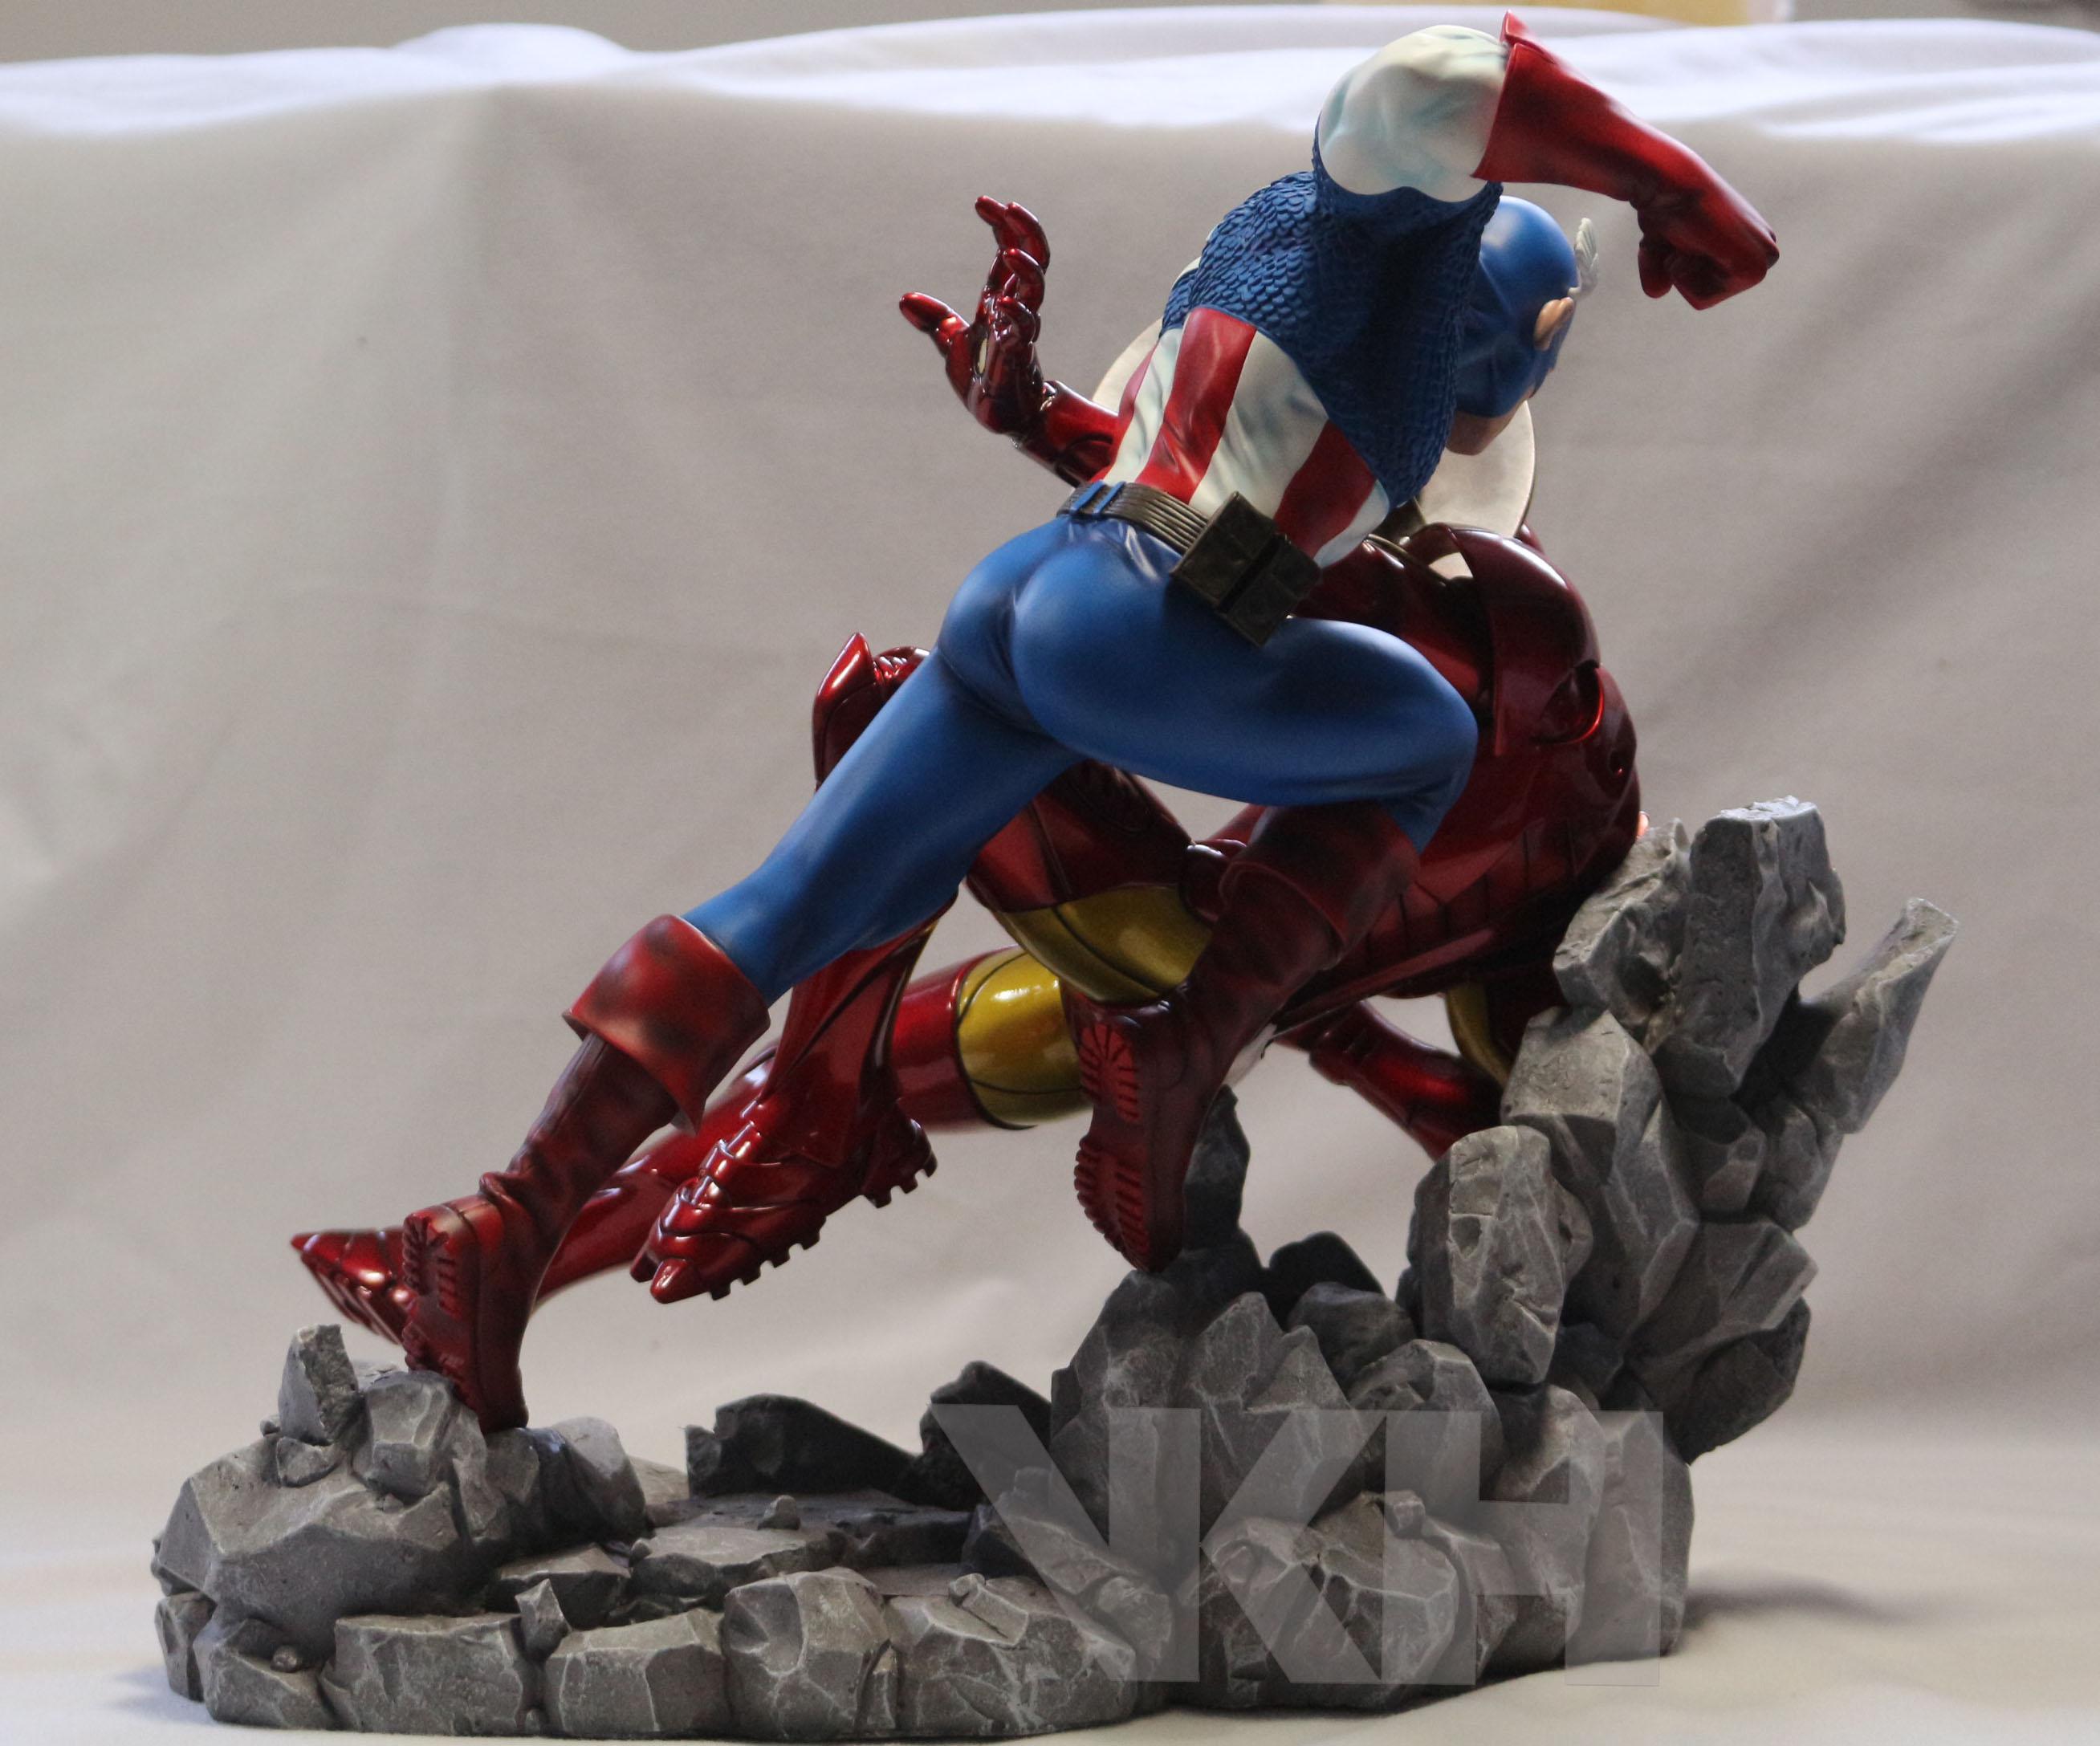 [Pop Culture Shock] Mortal Kombat: Kitana - 1/4 scale Statue - Página 6 IMG_3207%20copy